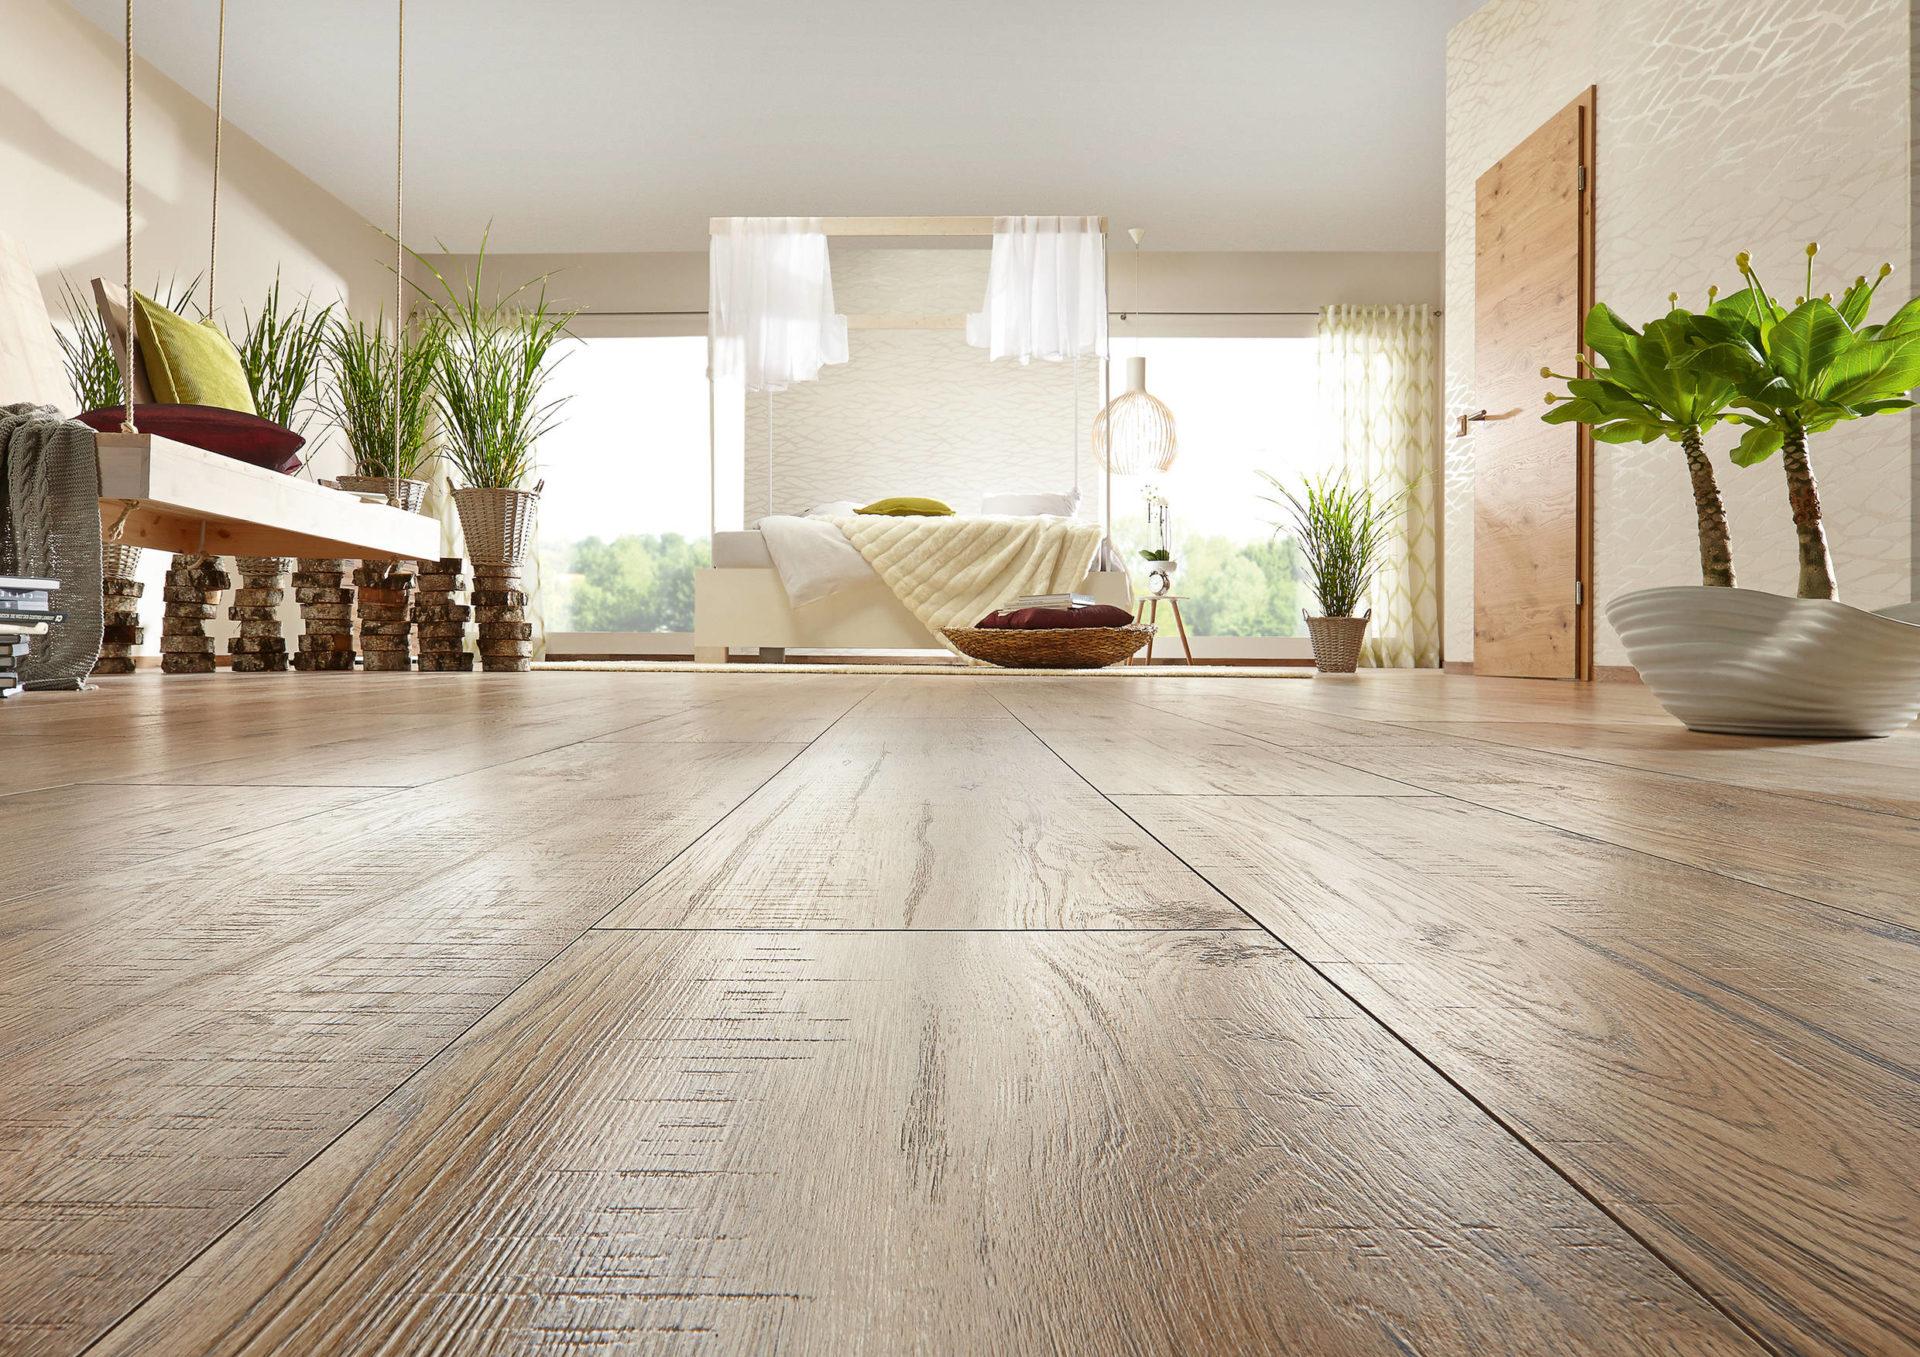 fachgesch ft f r fu boden freudenstadt fachh ndler aus der region. Black Bedroom Furniture Sets. Home Design Ideas